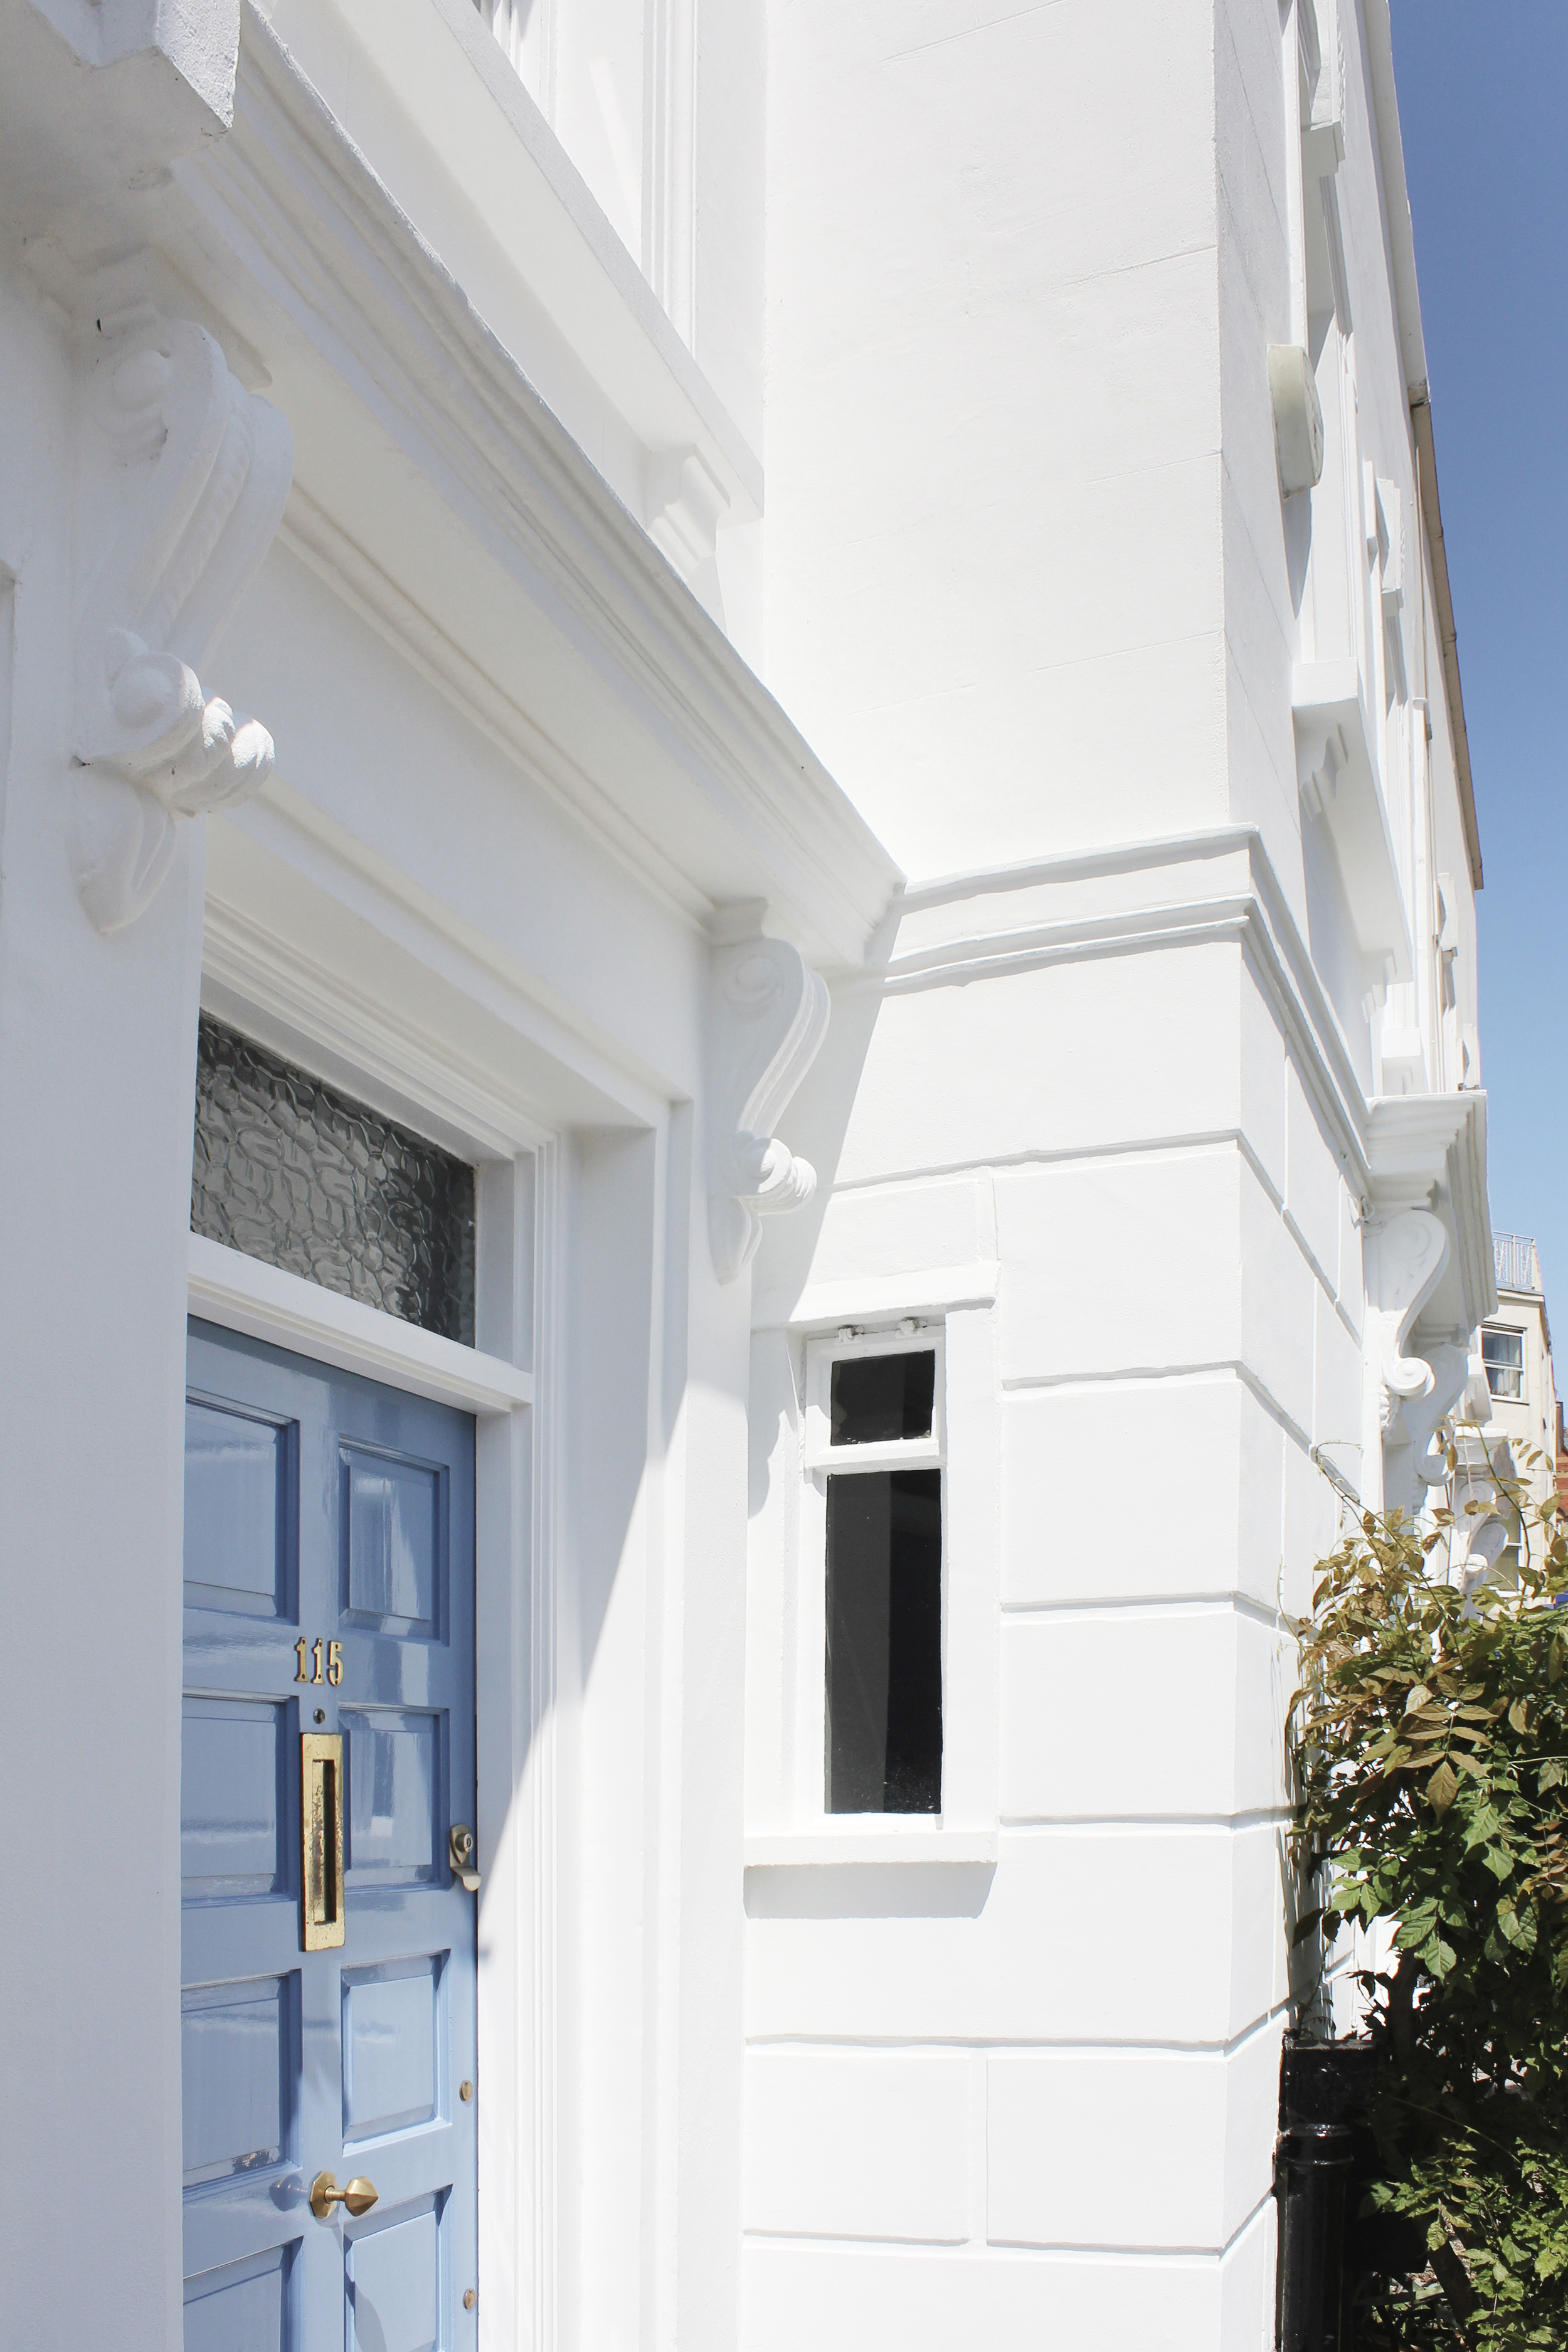 #NHRenovations #Painter #Decorator #London #Kentishtown #Listedbuilding #Windows #Masonry #Limeplaster #Frontdoor #Customisedblue #Keim #Keimminerals #Exterior #Building #Kentish